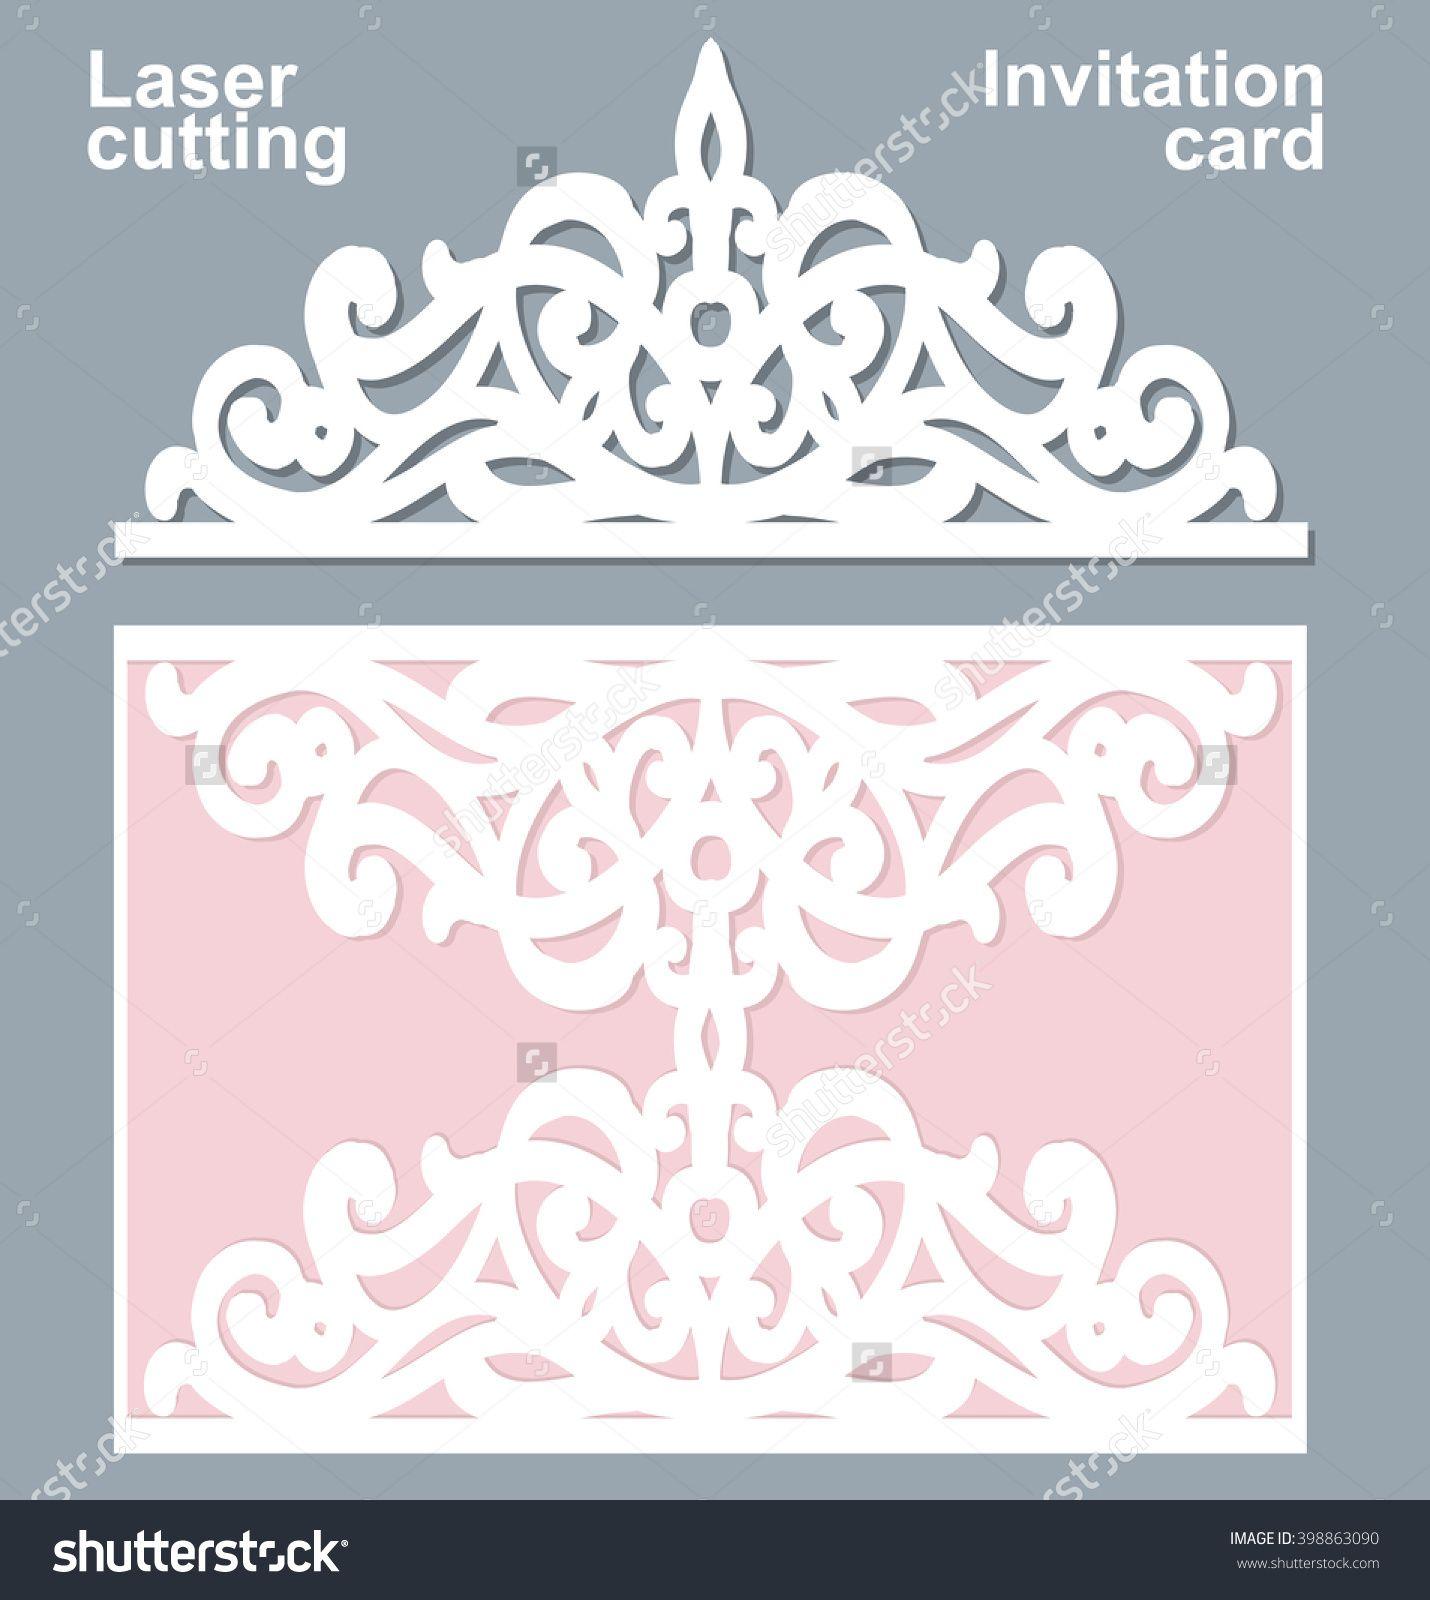 Vector die laser cut wedding card template. Wedding invitation card ...